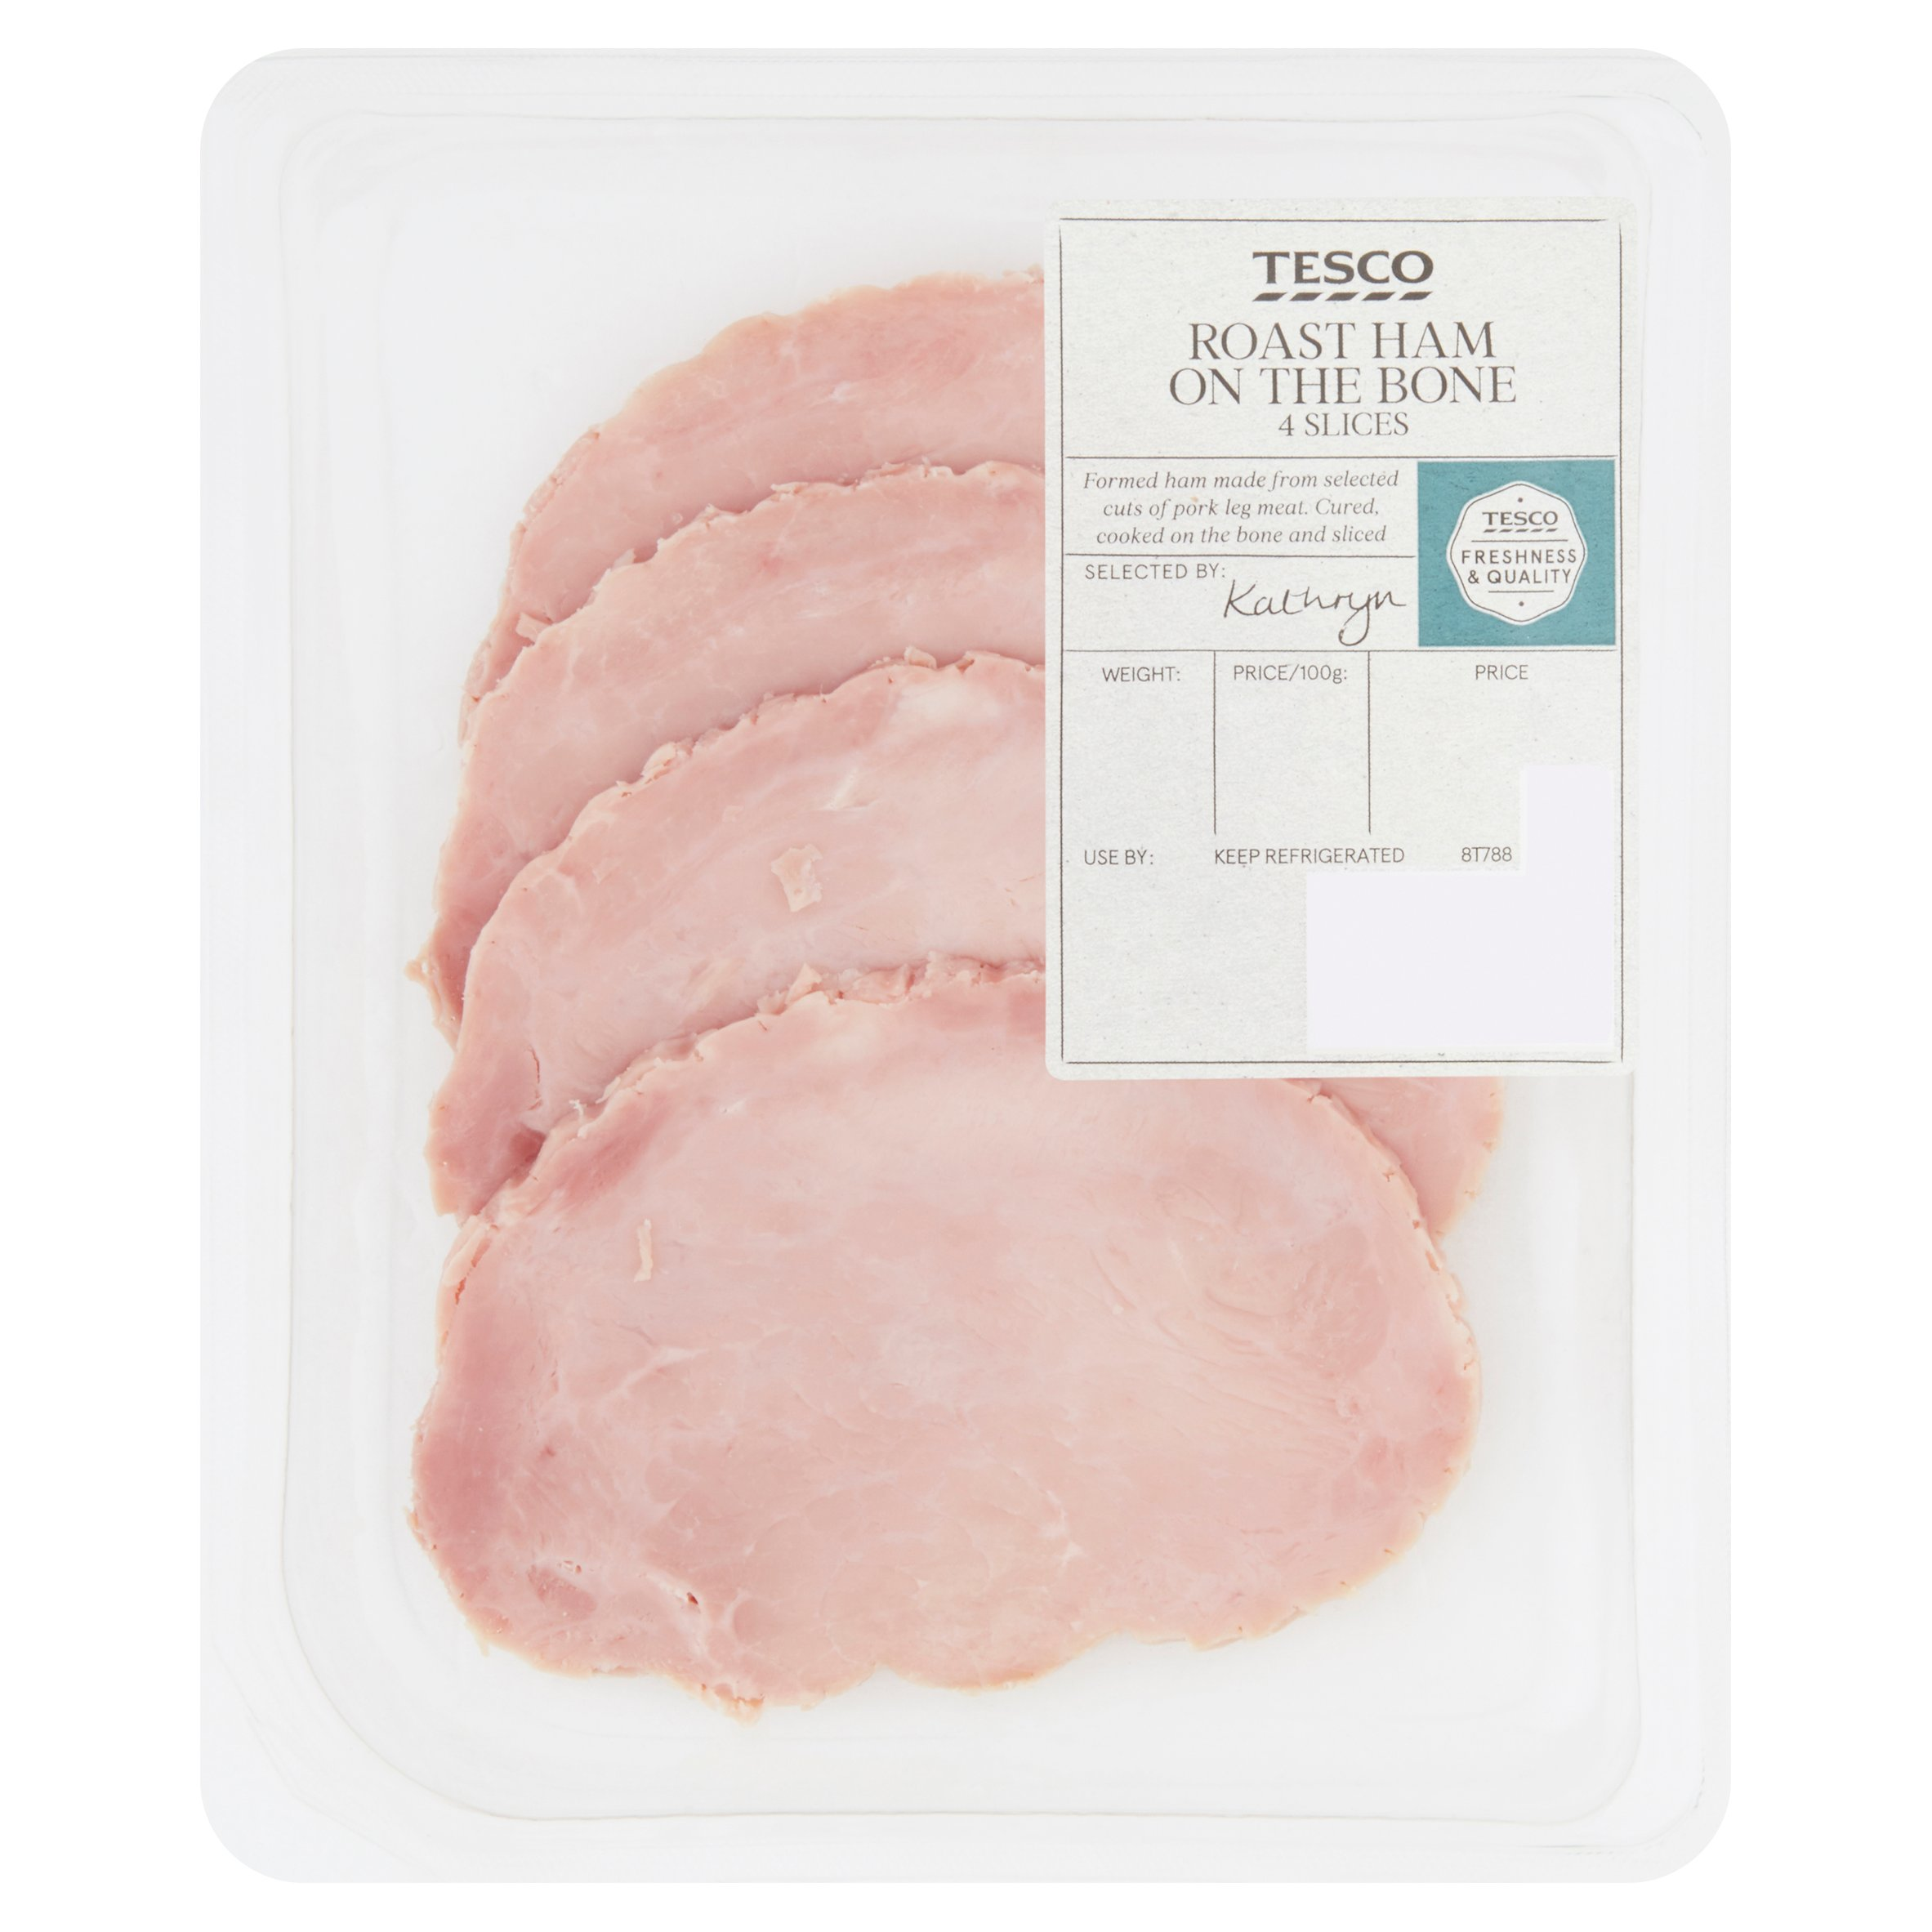 Tesco Roast Ham On The Bone 4 Slices